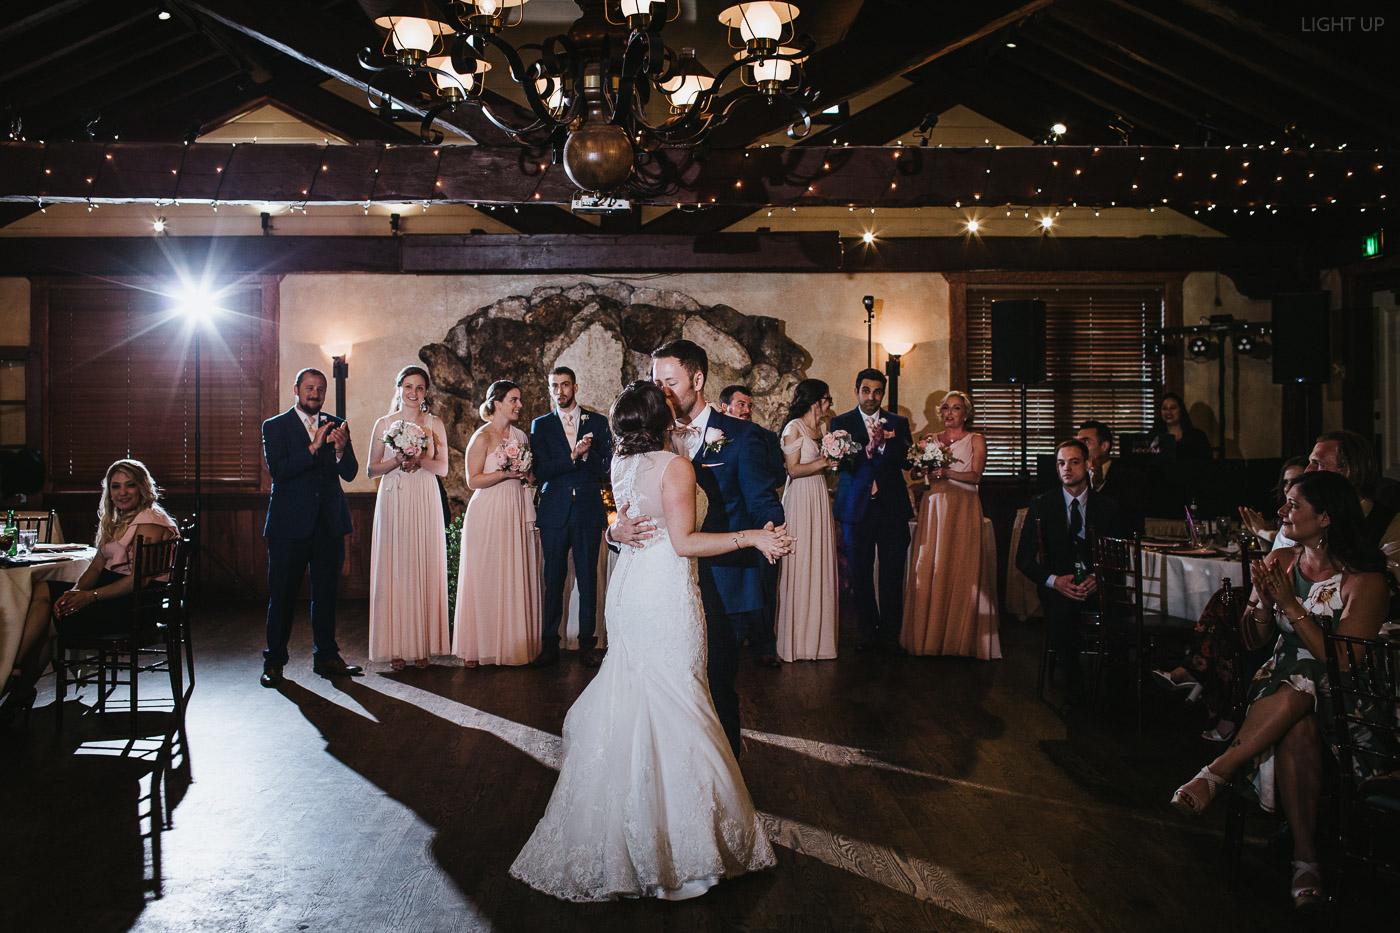 hstoric-dubsdread-wedding-orlando-44.jpg